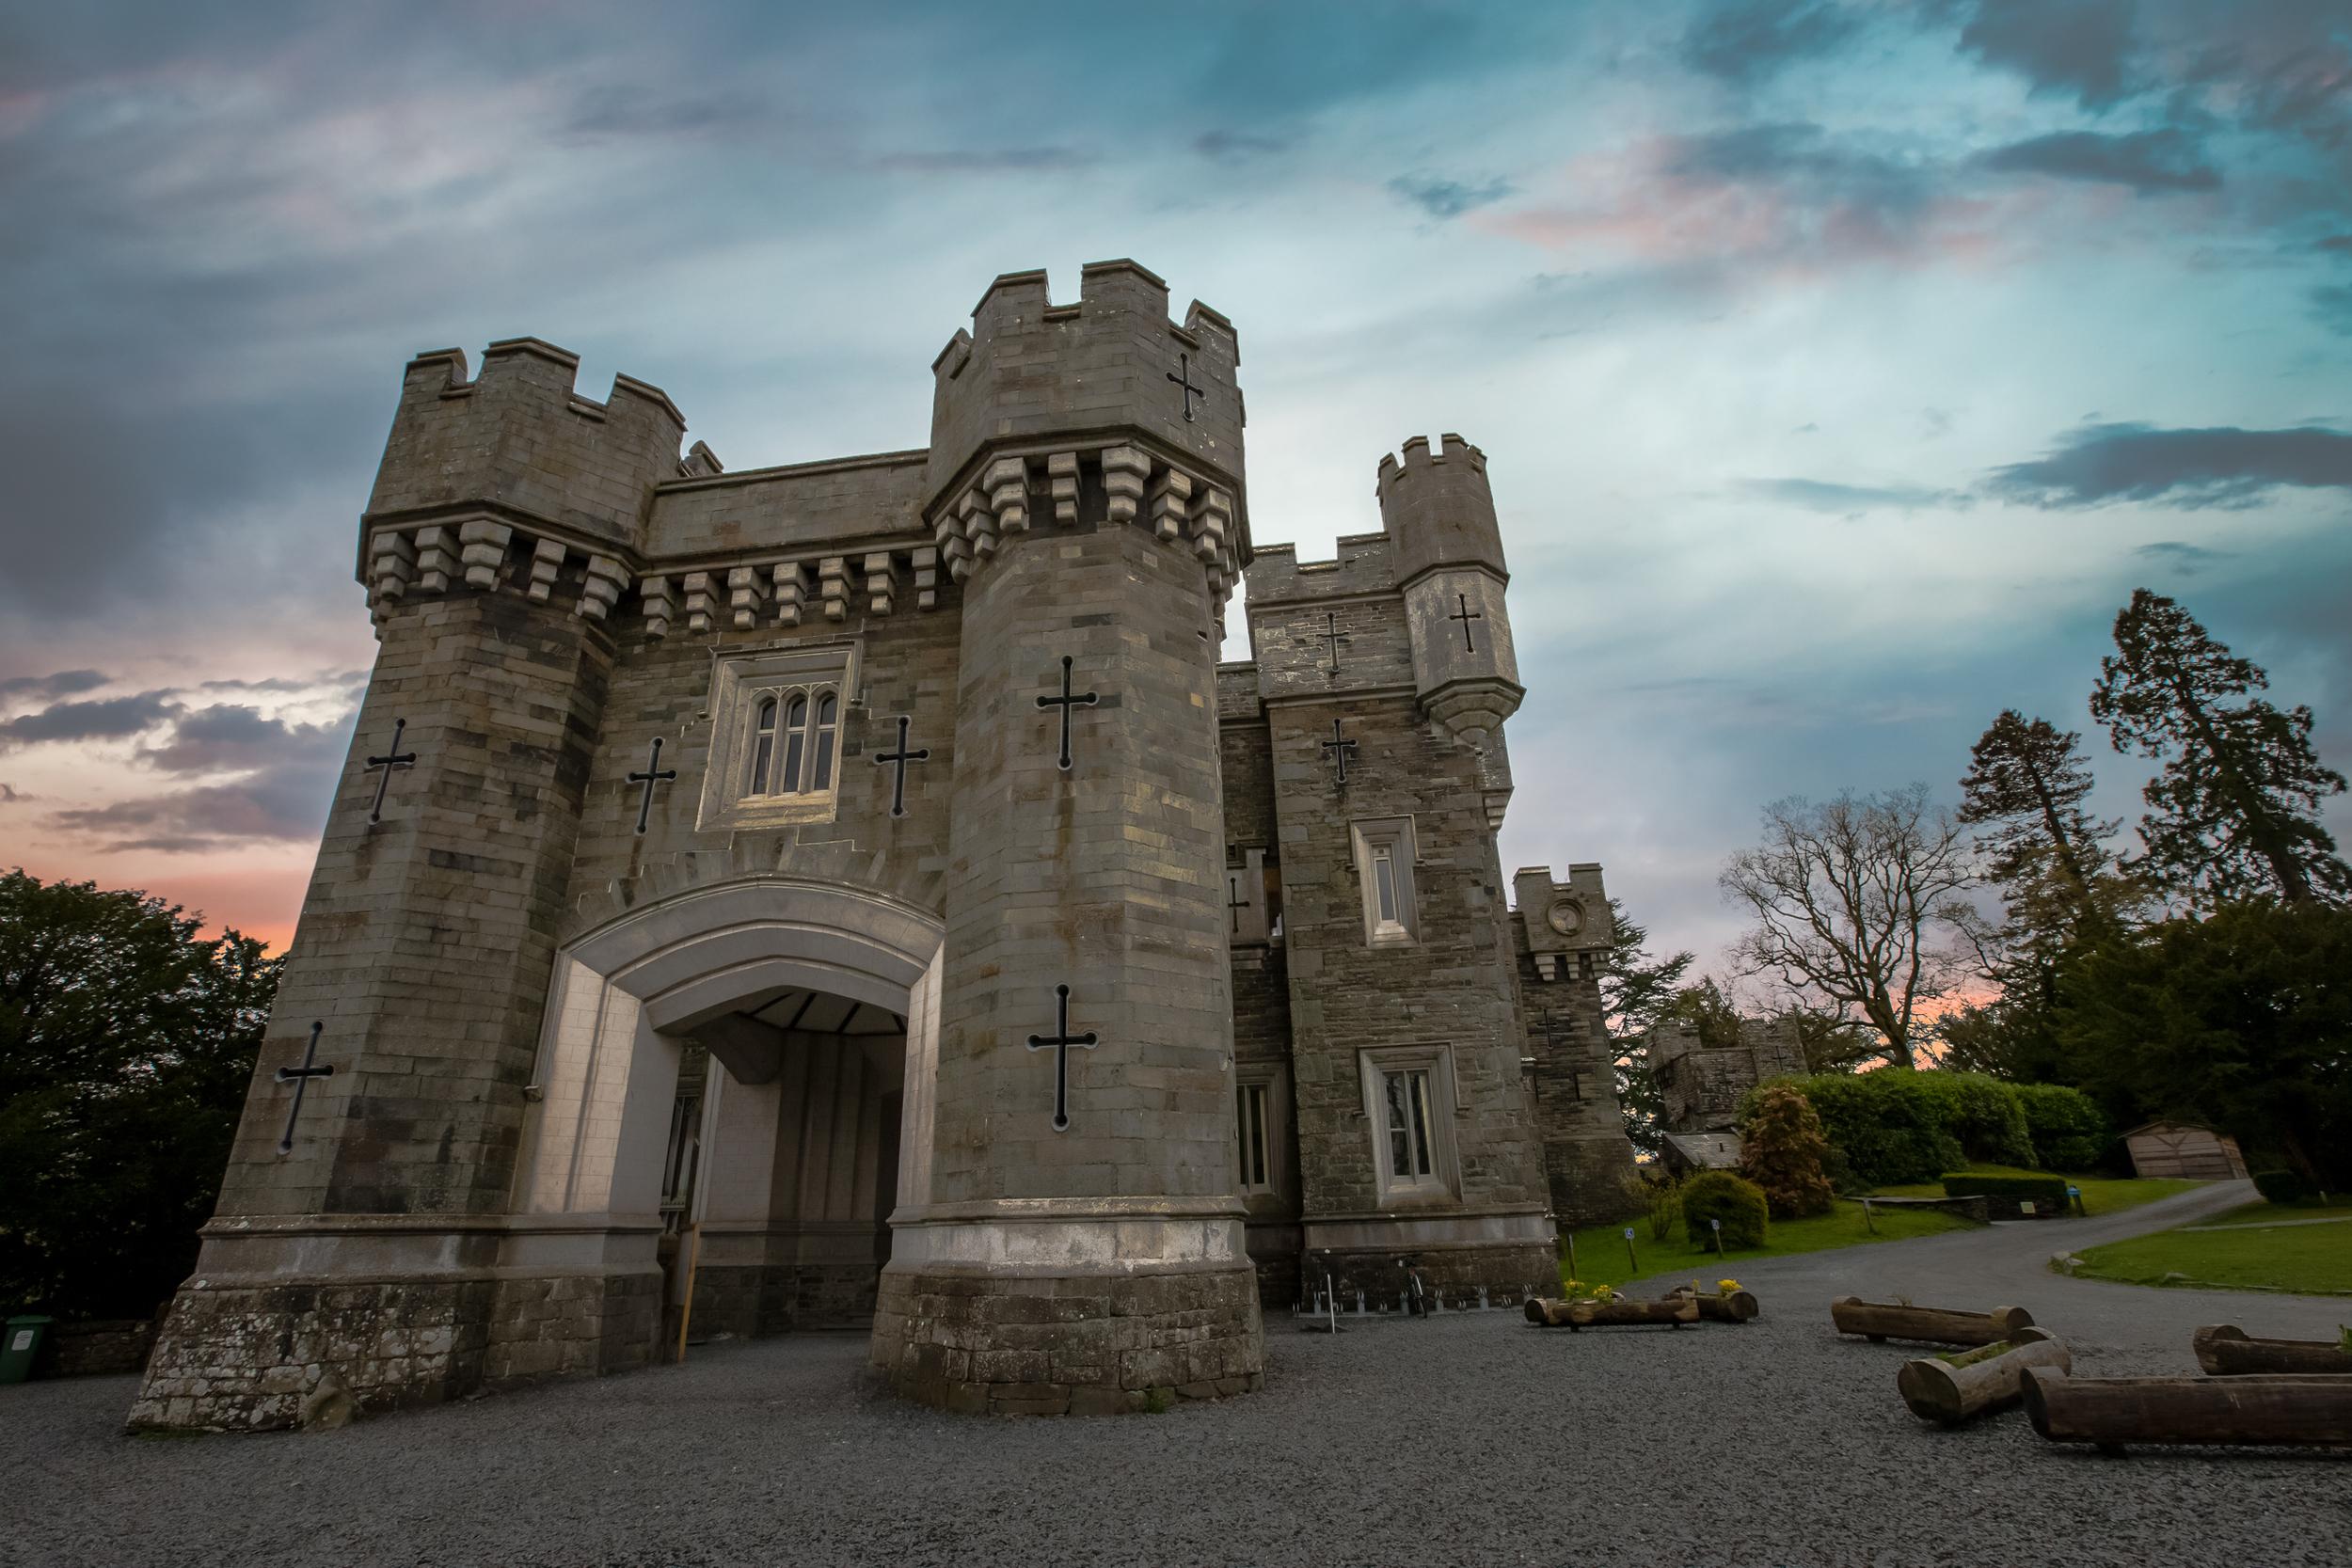 ©2015 jennifer bailey wray castle, windermere, cumbria